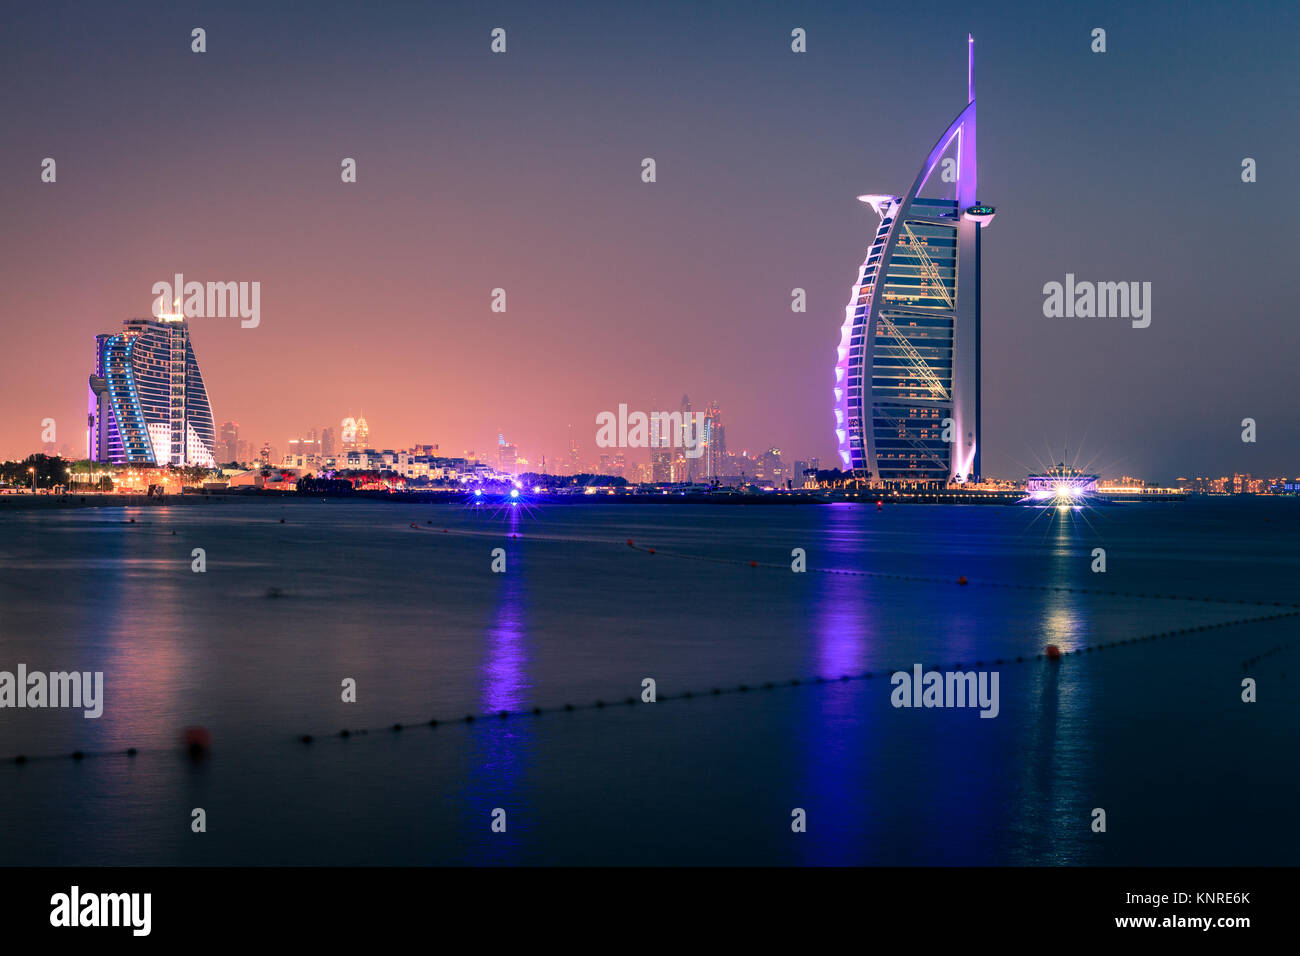 Dubai, Emiratos Árabes Unidos, Junio 7, 2016: Vista del mundialmente famoso Burj Al Arab y Jumeirah Beach hoteles Foto de stock